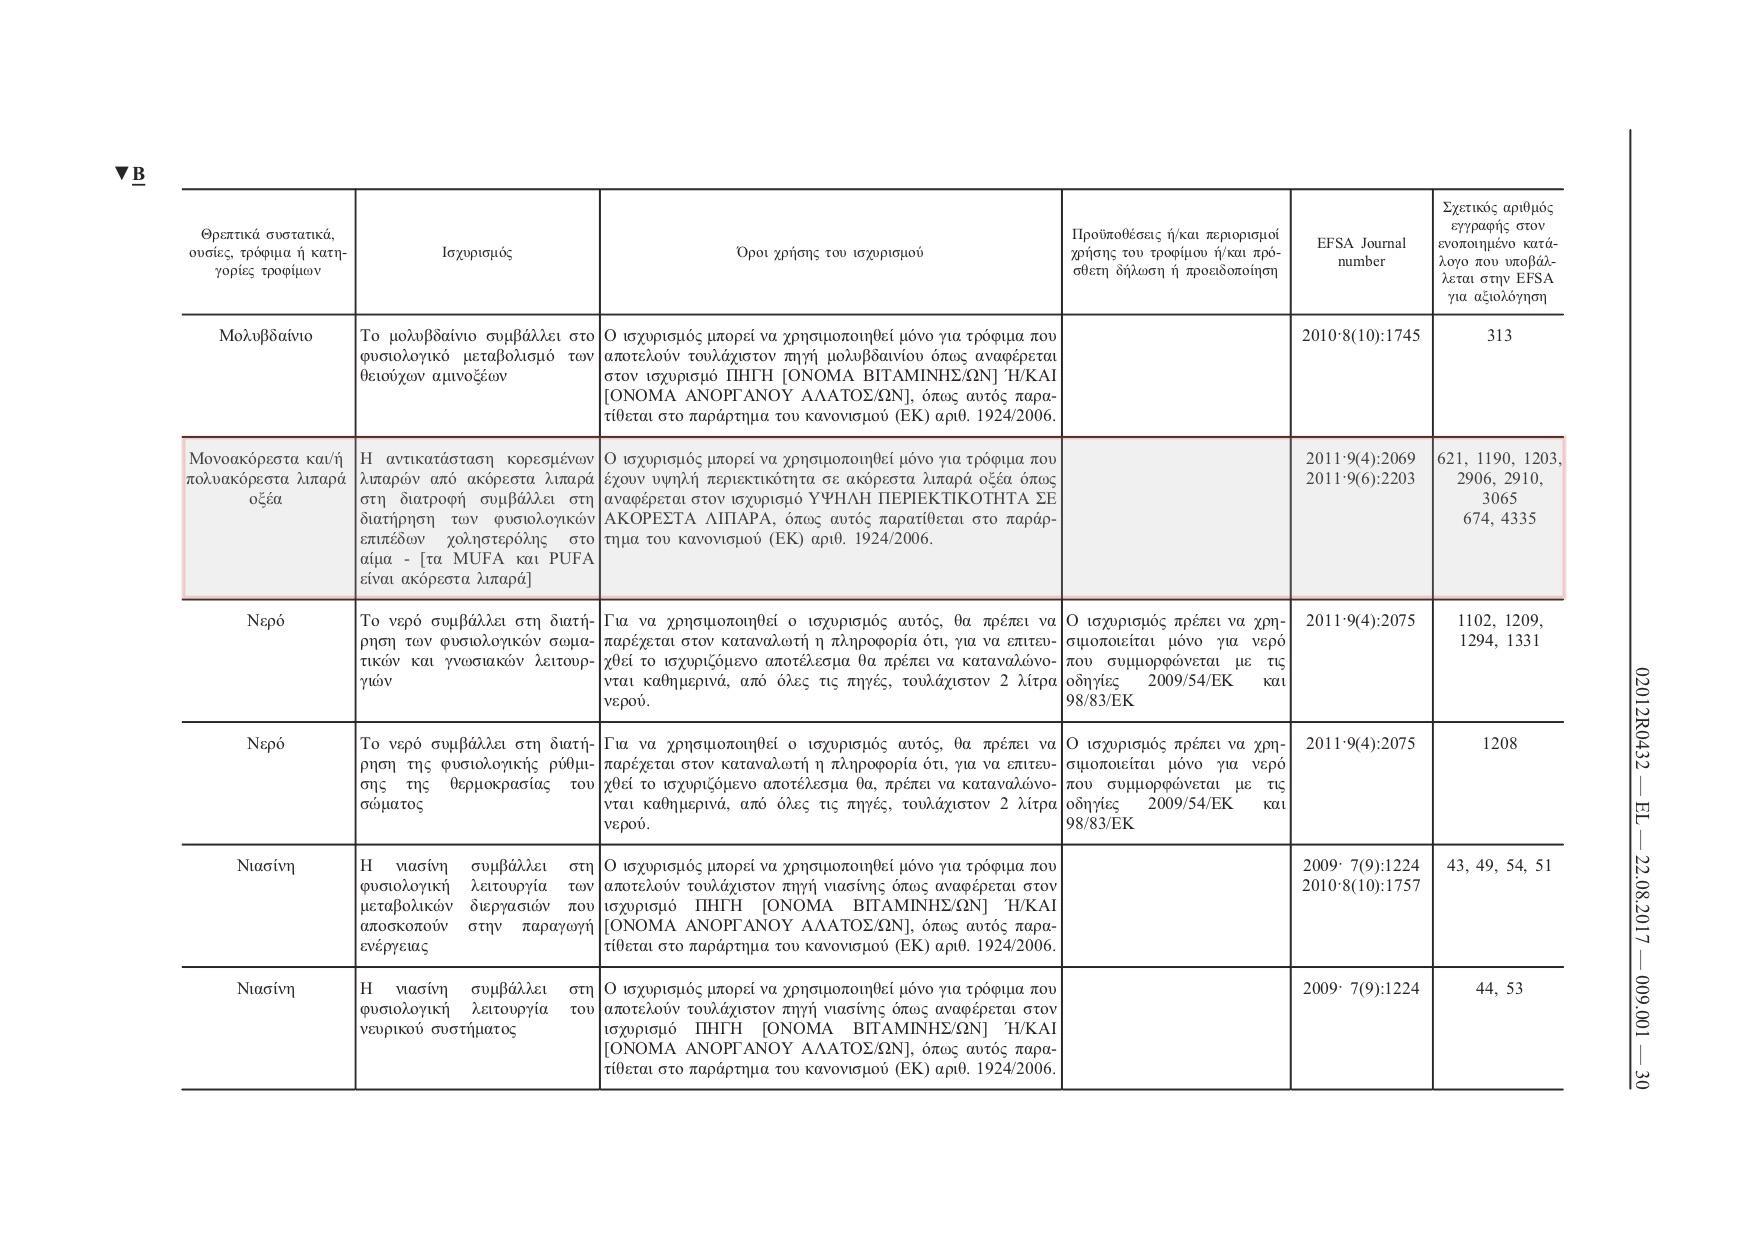 <i>Ο εγκεκριμένος ισχυρισμός υγείας για τα μονοακόρεστα και/ή πολυακόρεστα λιπαρά οξέα [Επικαιροποιημένος (22-08-2017) Κανονισμός (ΕΕ) αριθμ. 432/2012 της Επιτροπής της 16ης Μαΐου  2012. σ. 30].</i>